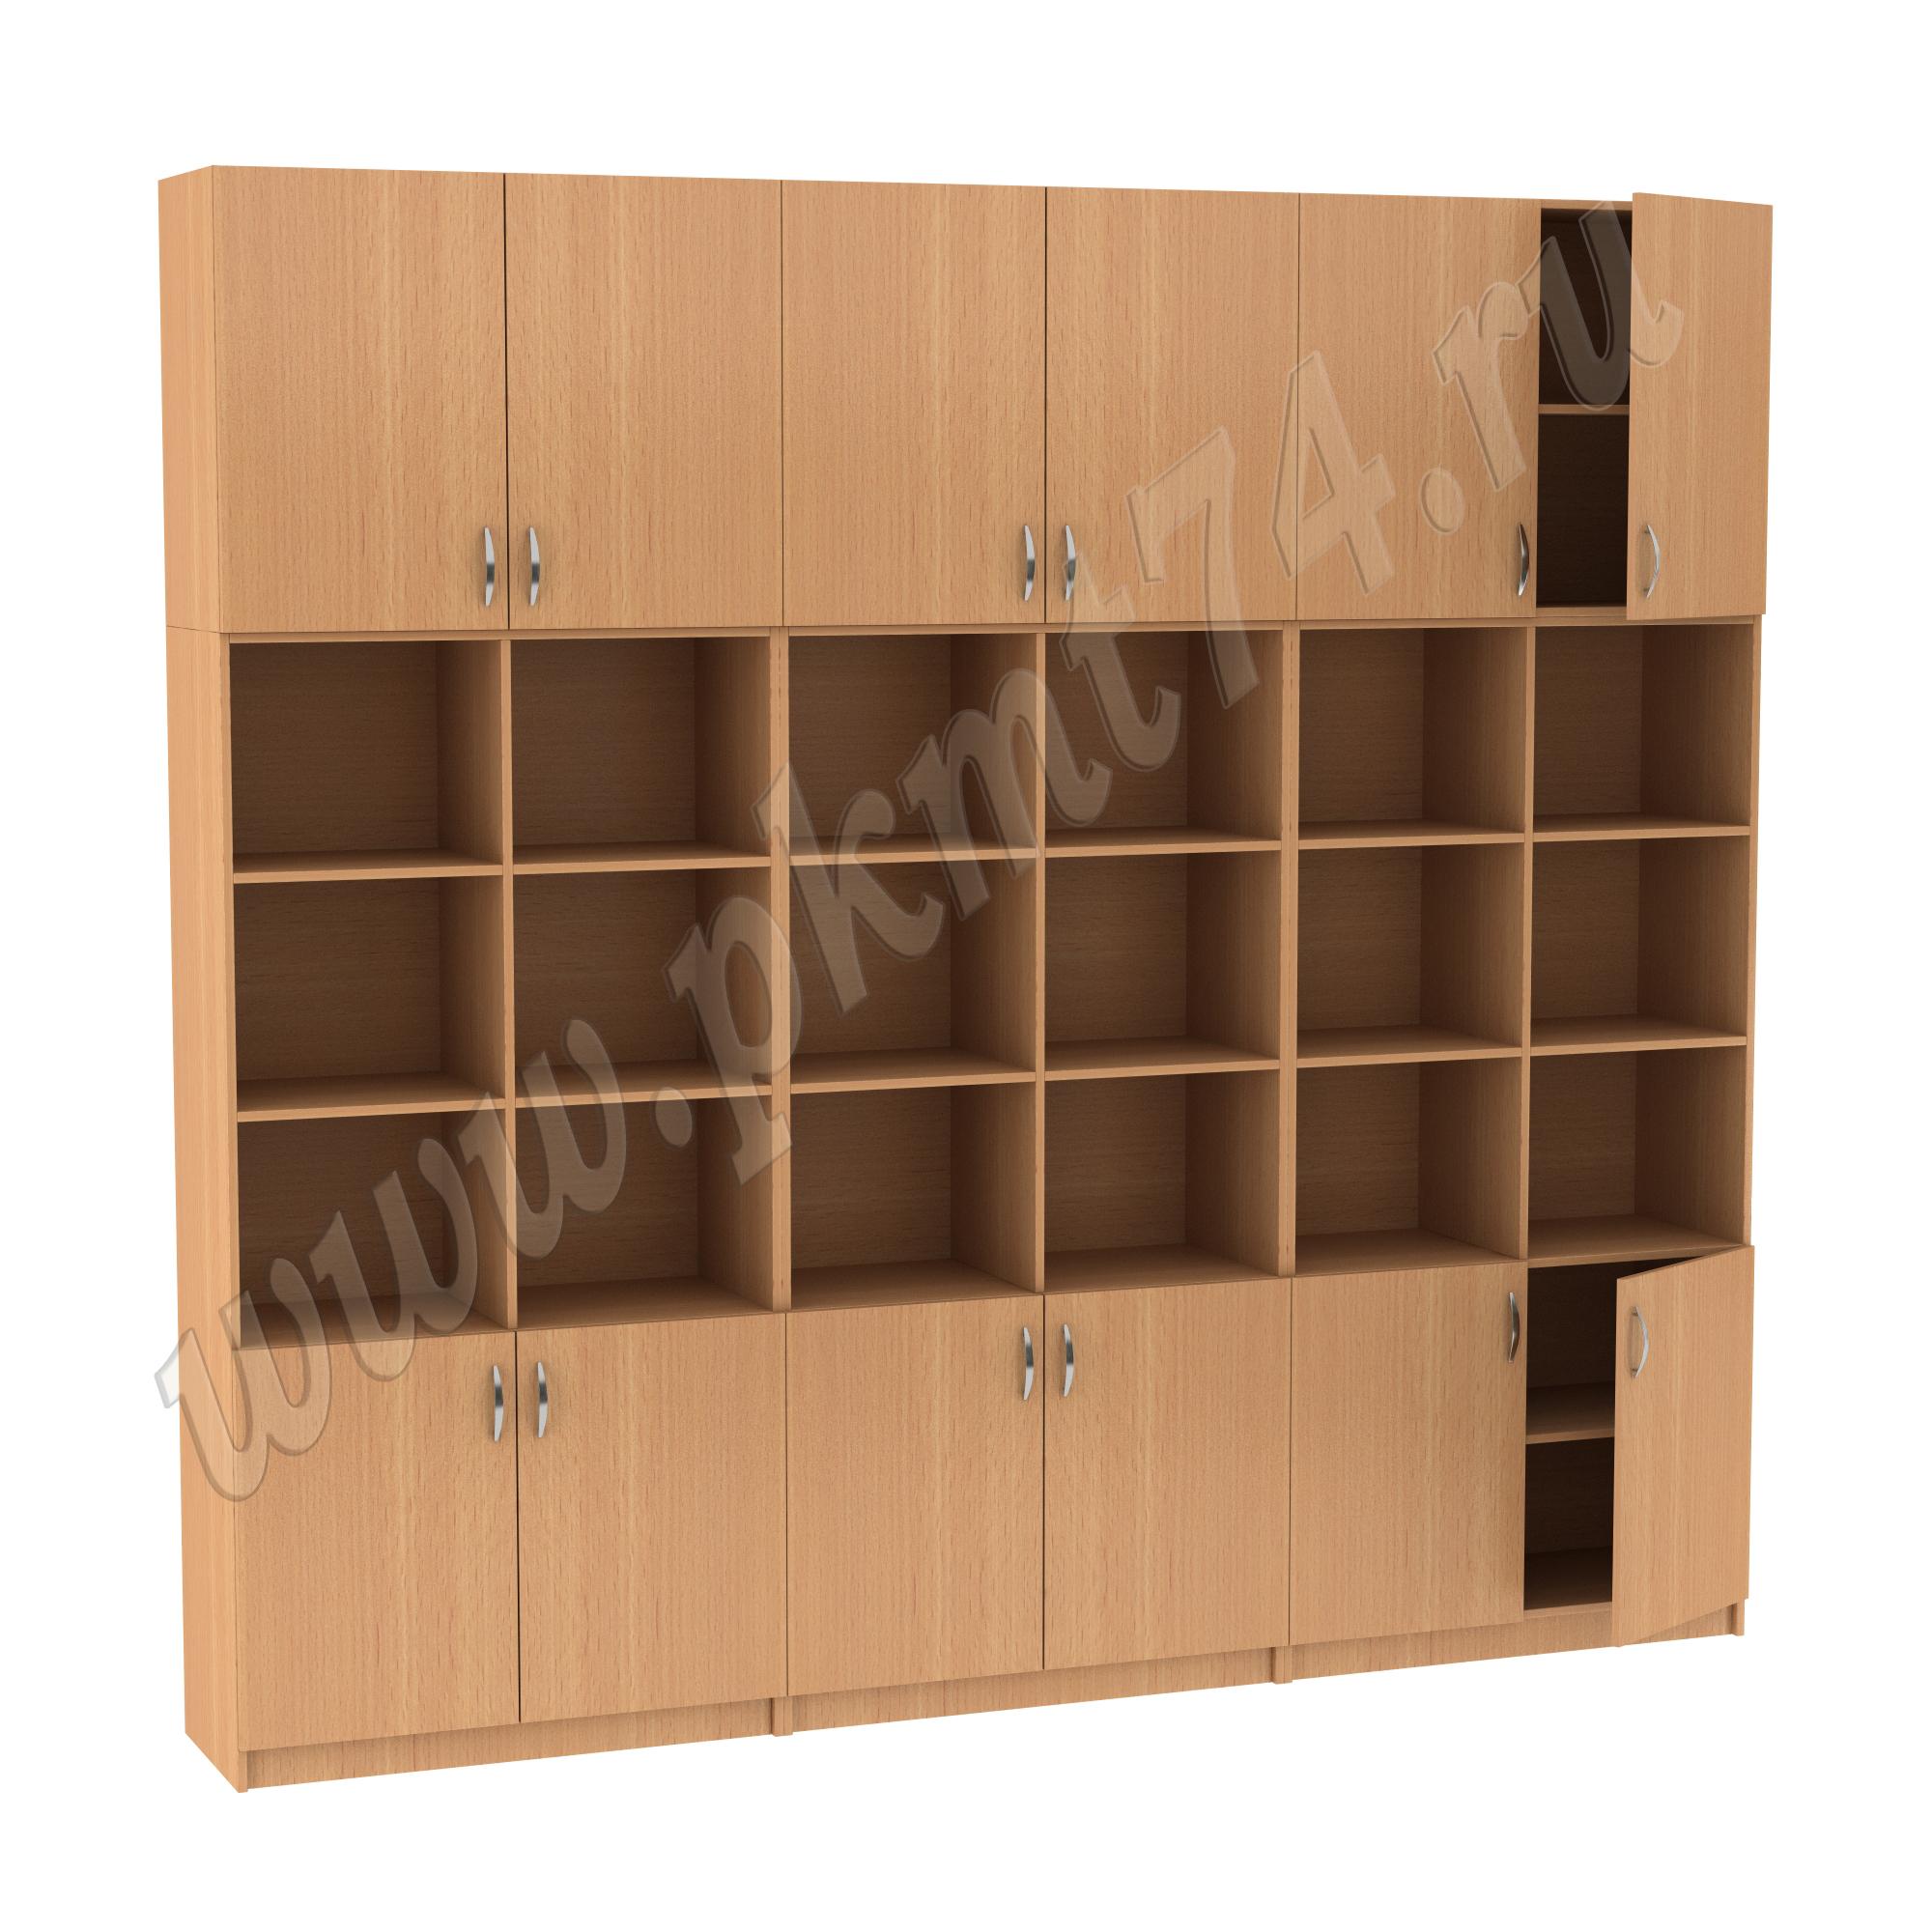 Набор шкафов с антресолями MT 14-34-14 Бук